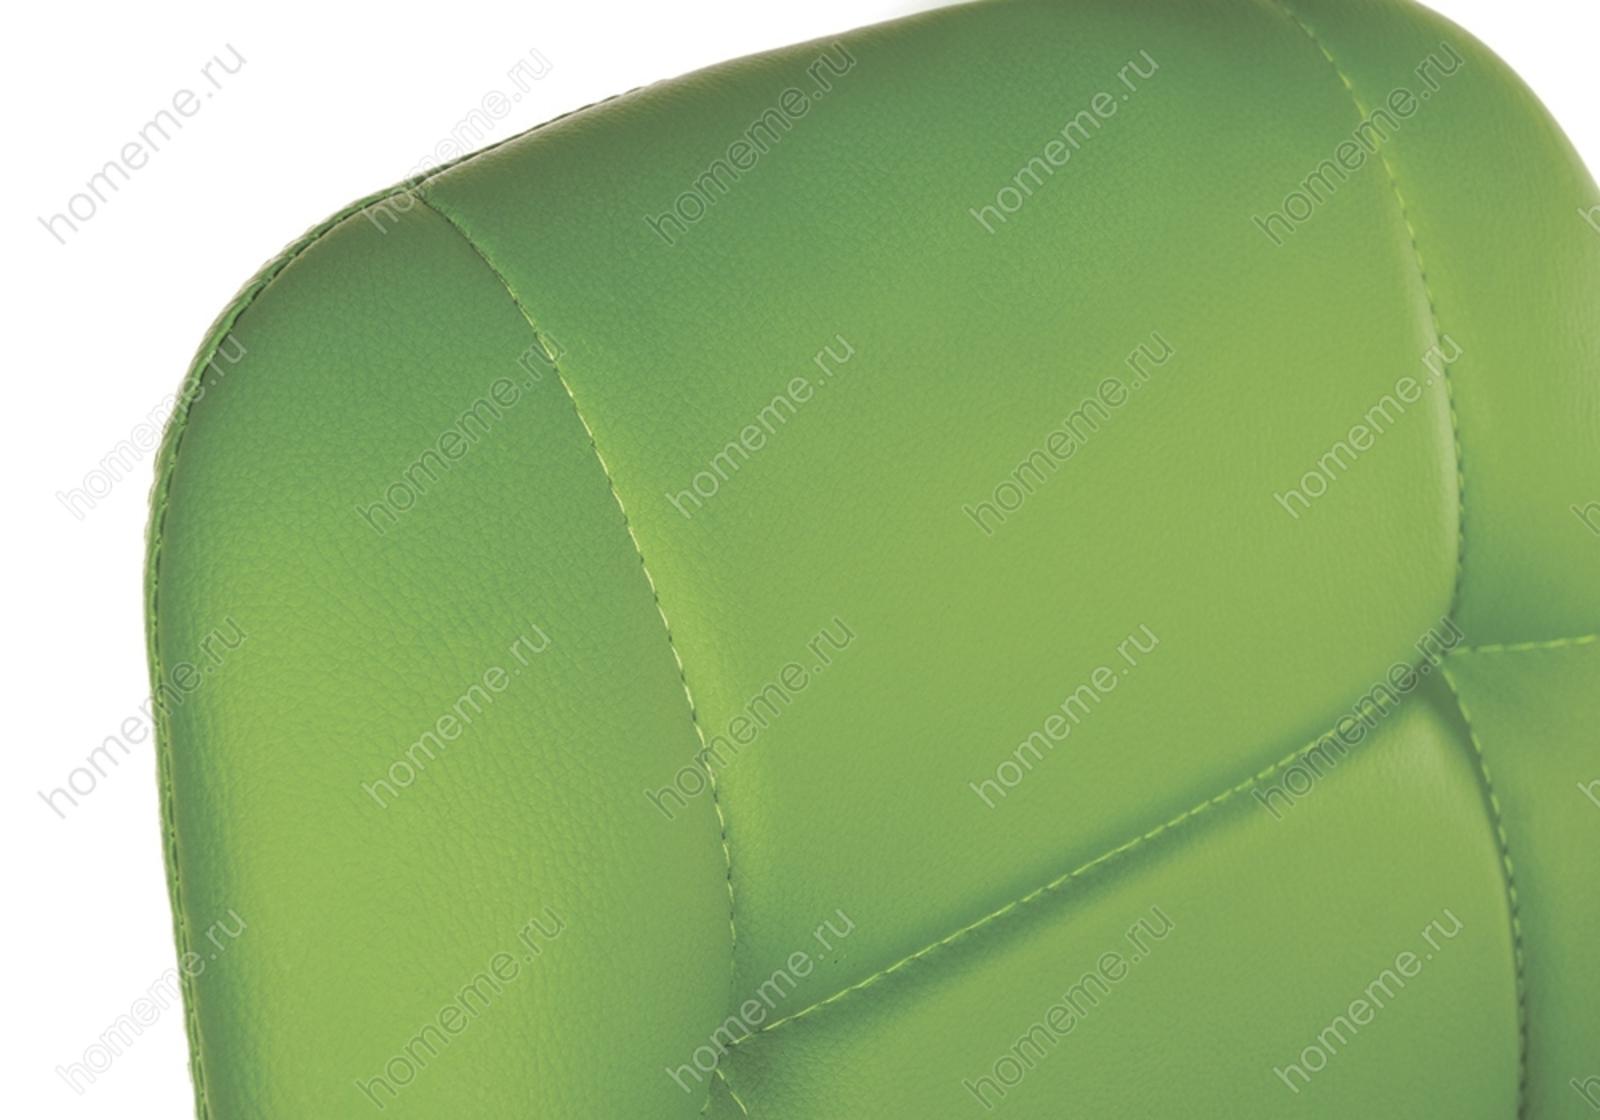 Барный стул EAMES зеленый зеленый (1384)